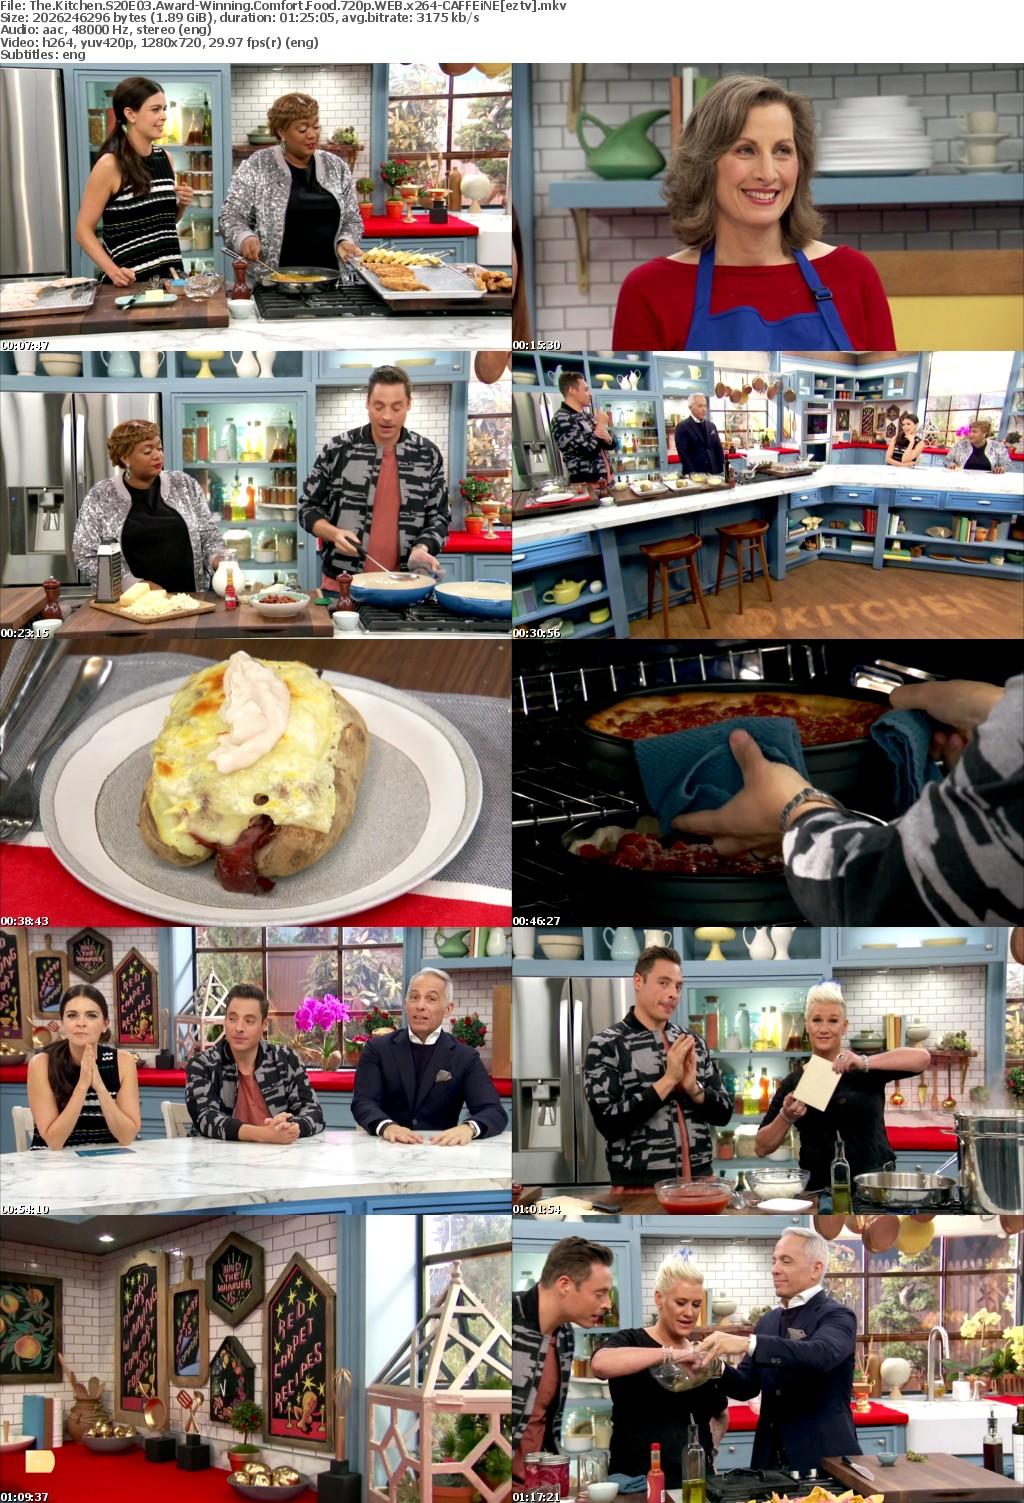 The Kitchen S20E03 Award-Winning Comfort Food 720p WEB x264-CAFFEiNE